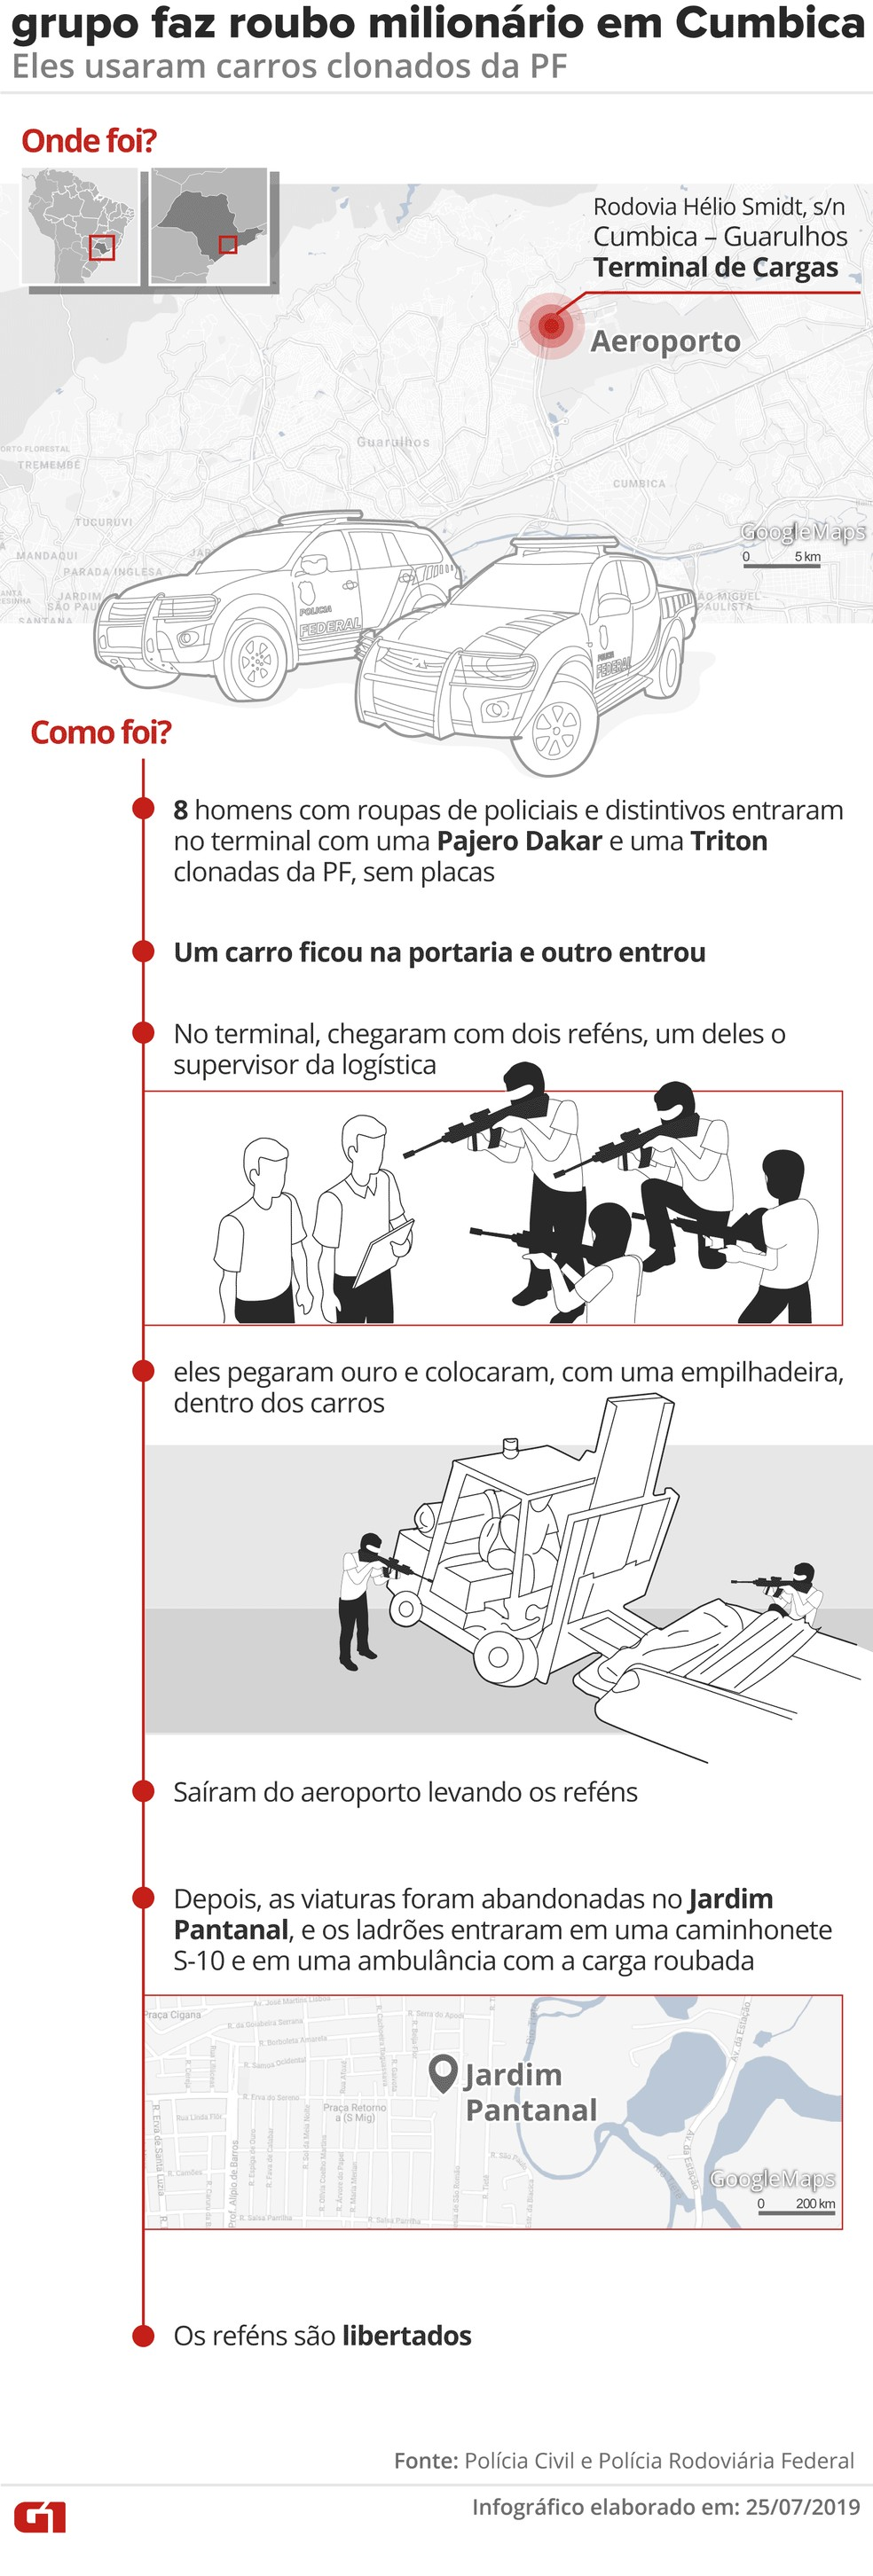 Grupo fortemente armado invade terminal de cargas de Cumbica, faz reféns e rouba ouro — Foto: Arte / G1